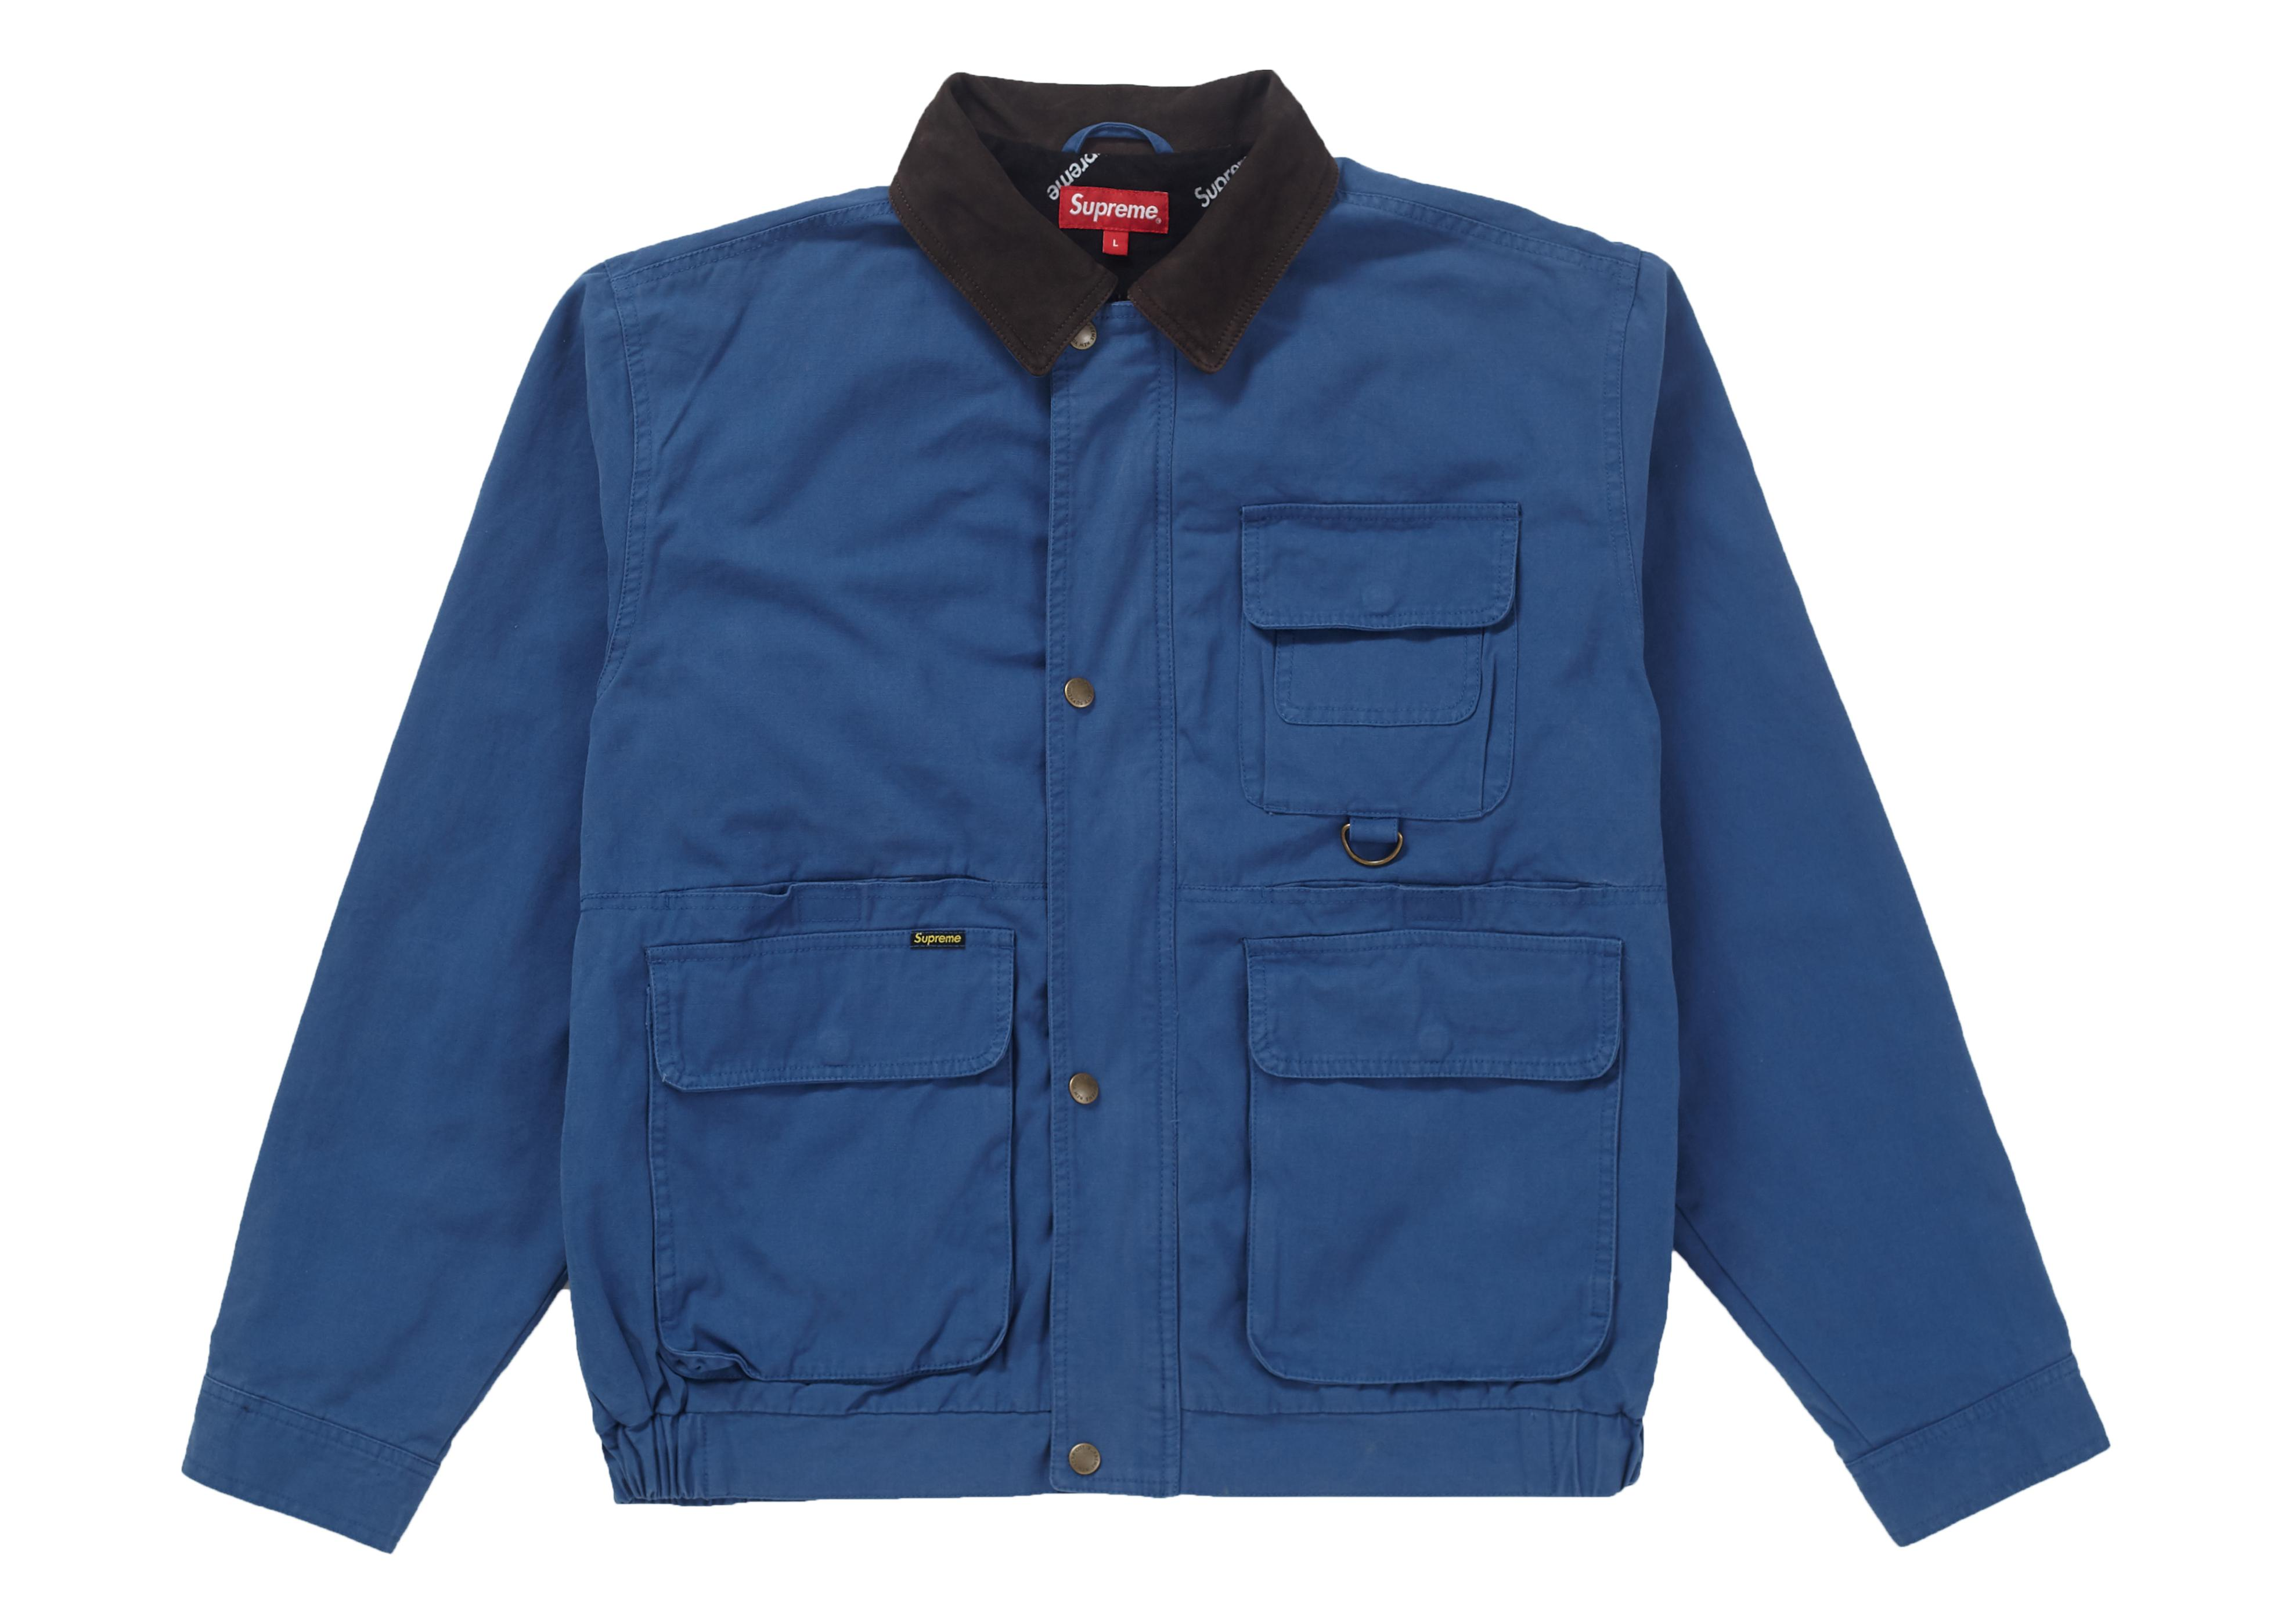 Supreme Field Jacket Blue For Men - Lyst